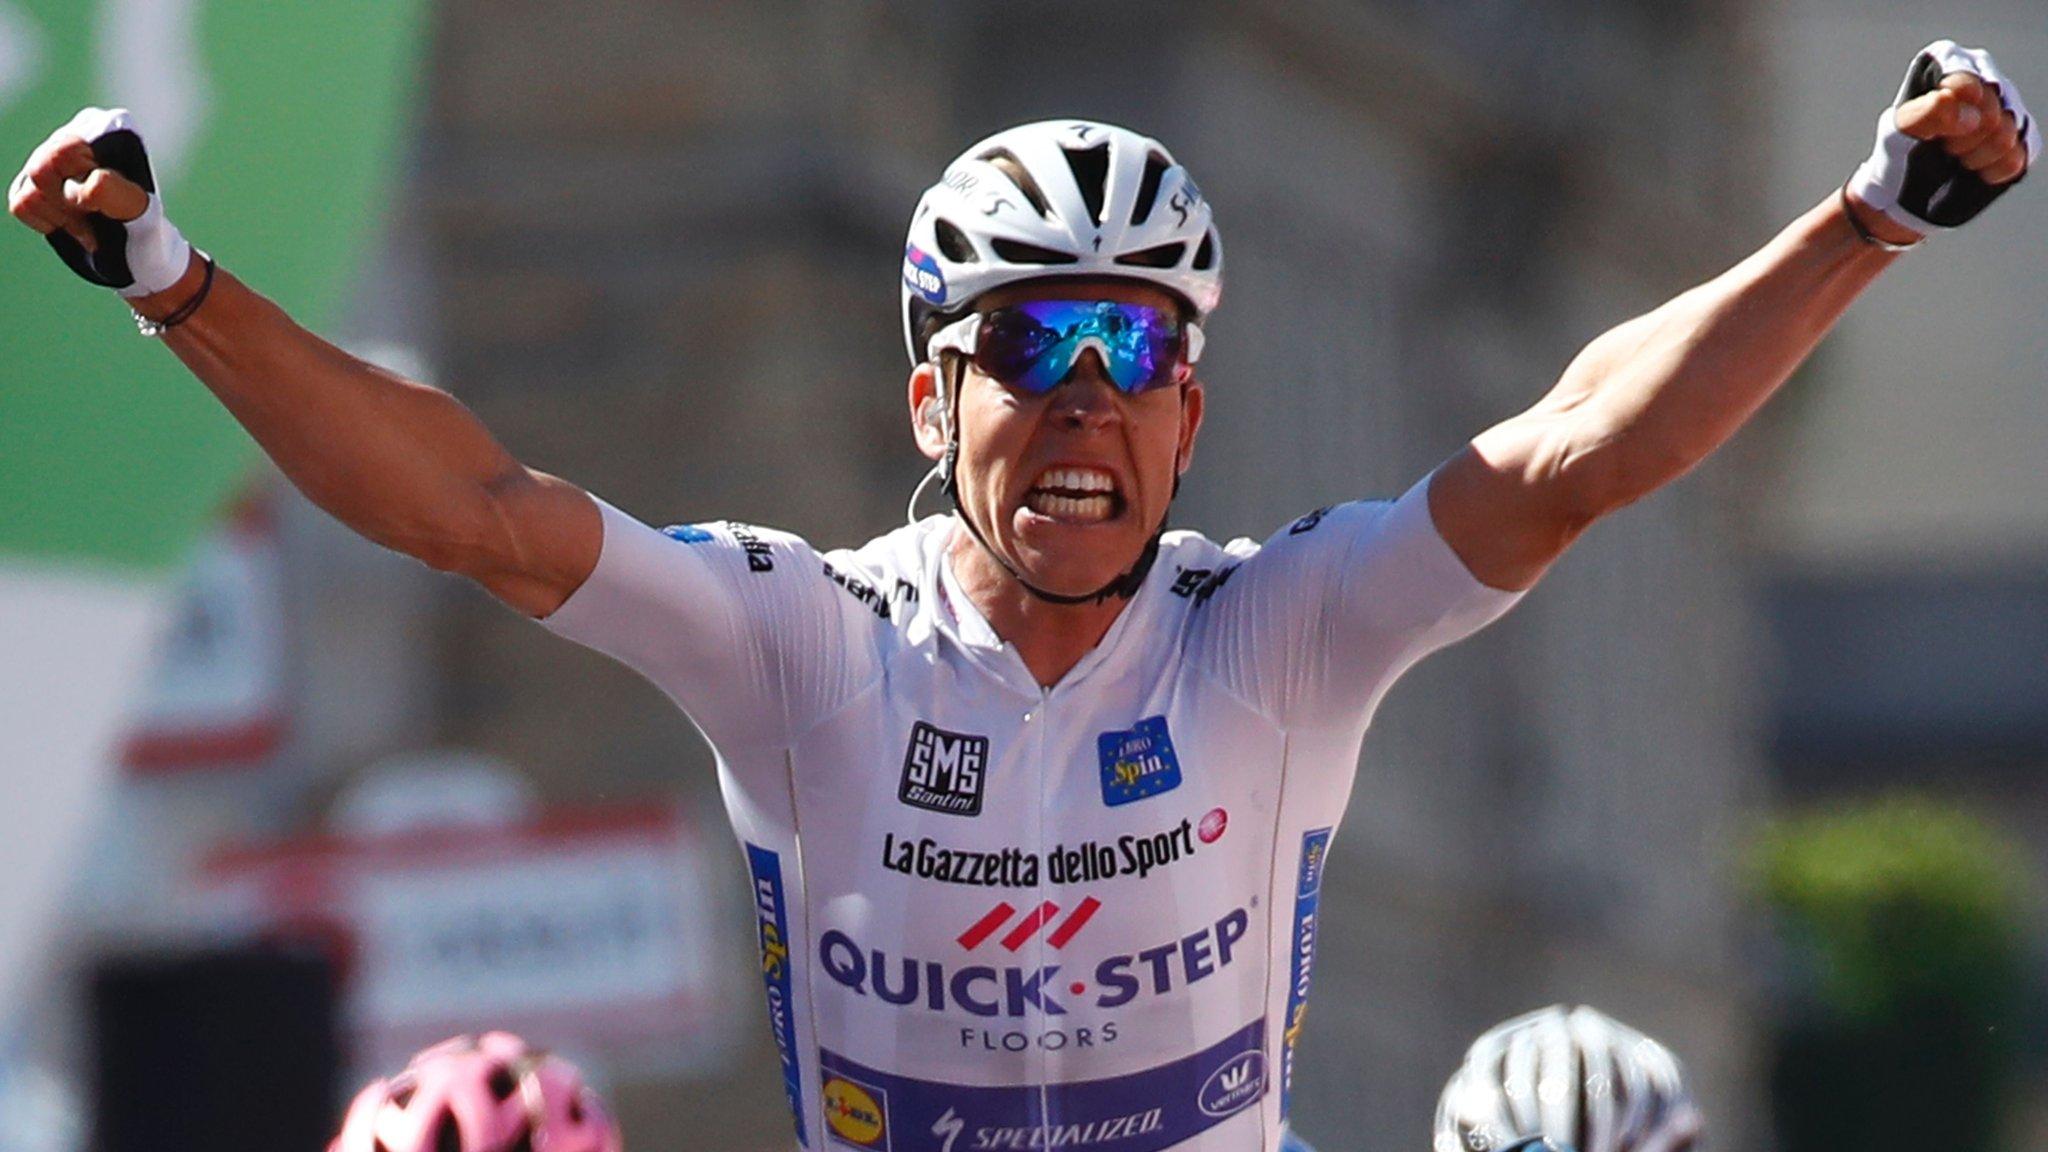 Giro d'Italia 2017: Bob Jungels wins stage 15 as Nairo Quintana takes back six seconds